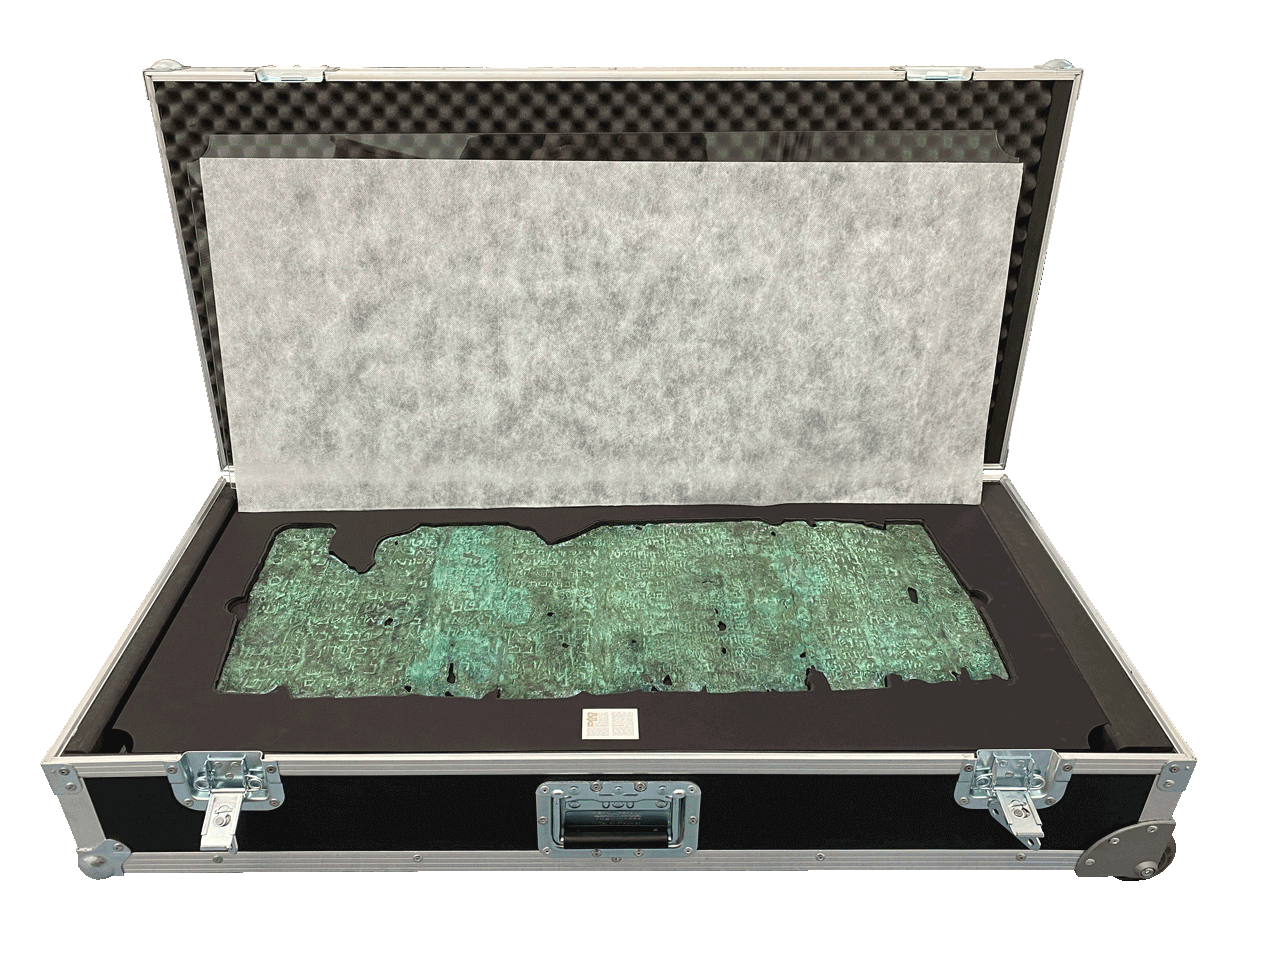 "The Copper Scroll's heavy-duty shipping case<small><a href=""https://www.facsimile-editions.com/copyright/"">© Copyright 2021 Facsimile Editions Ltd</a></small>"